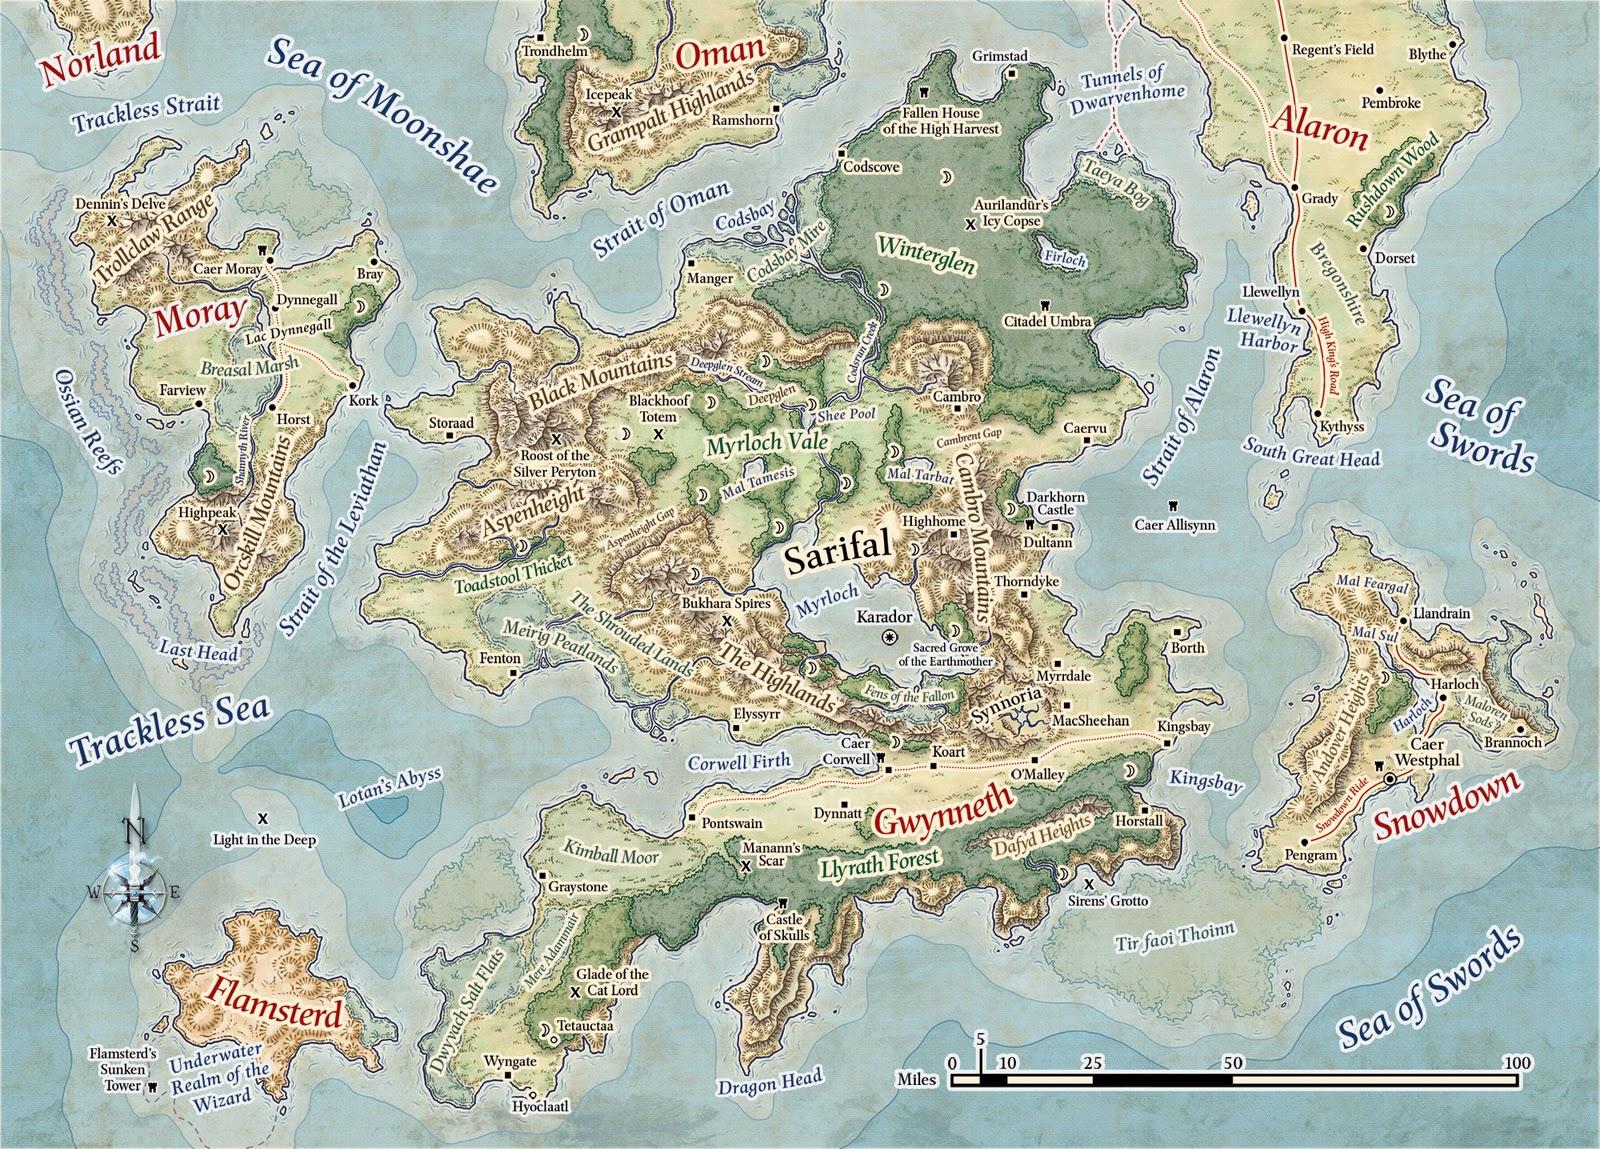 PZ C: Maps